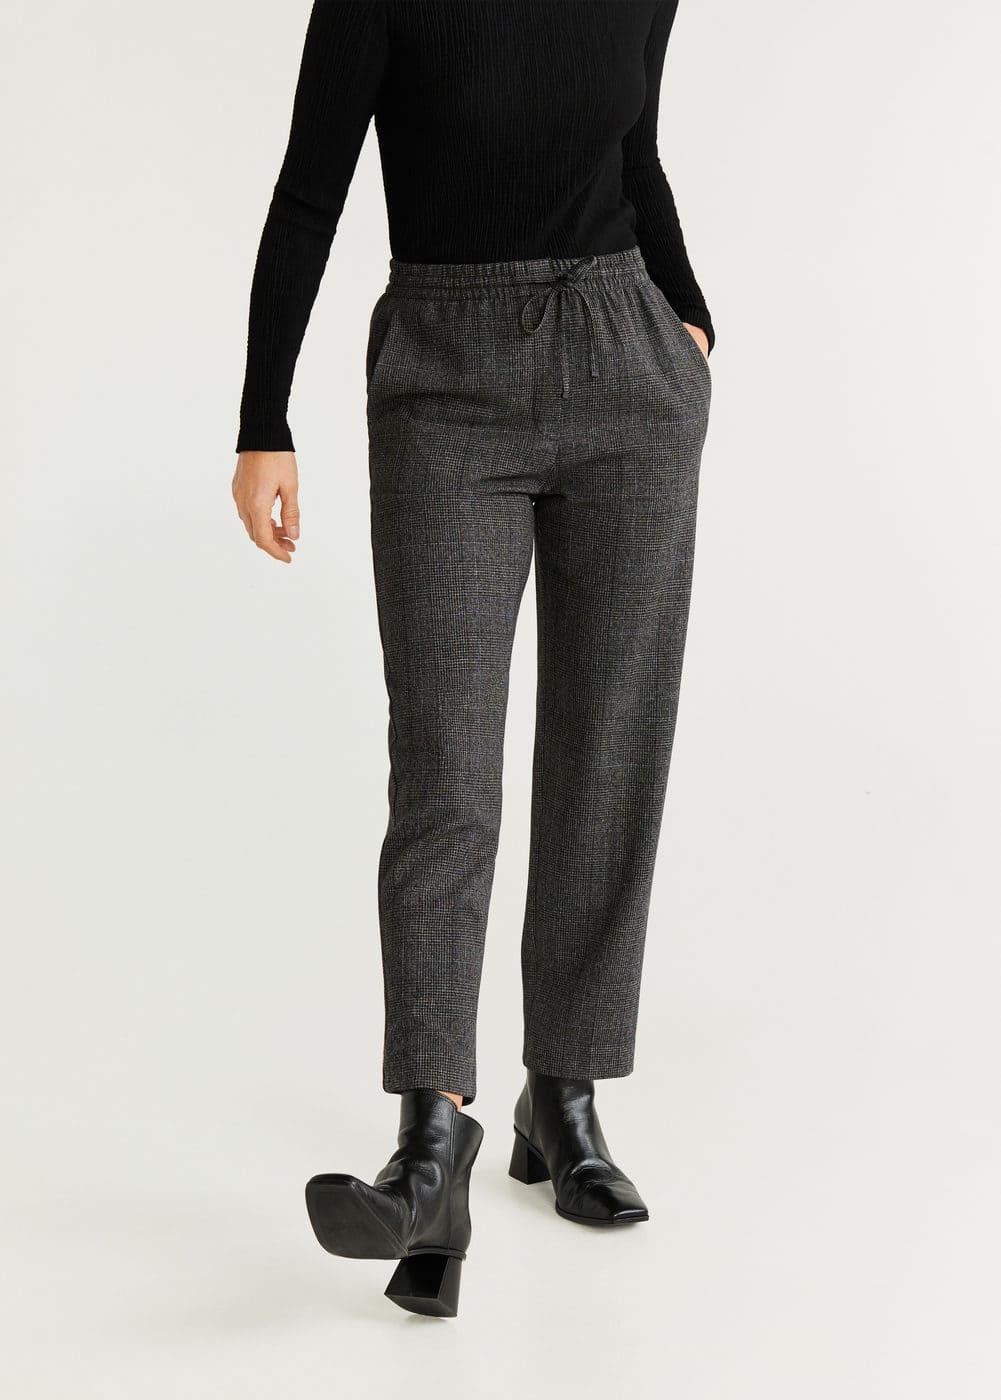 m-ricardo:pantalon cintura elastica